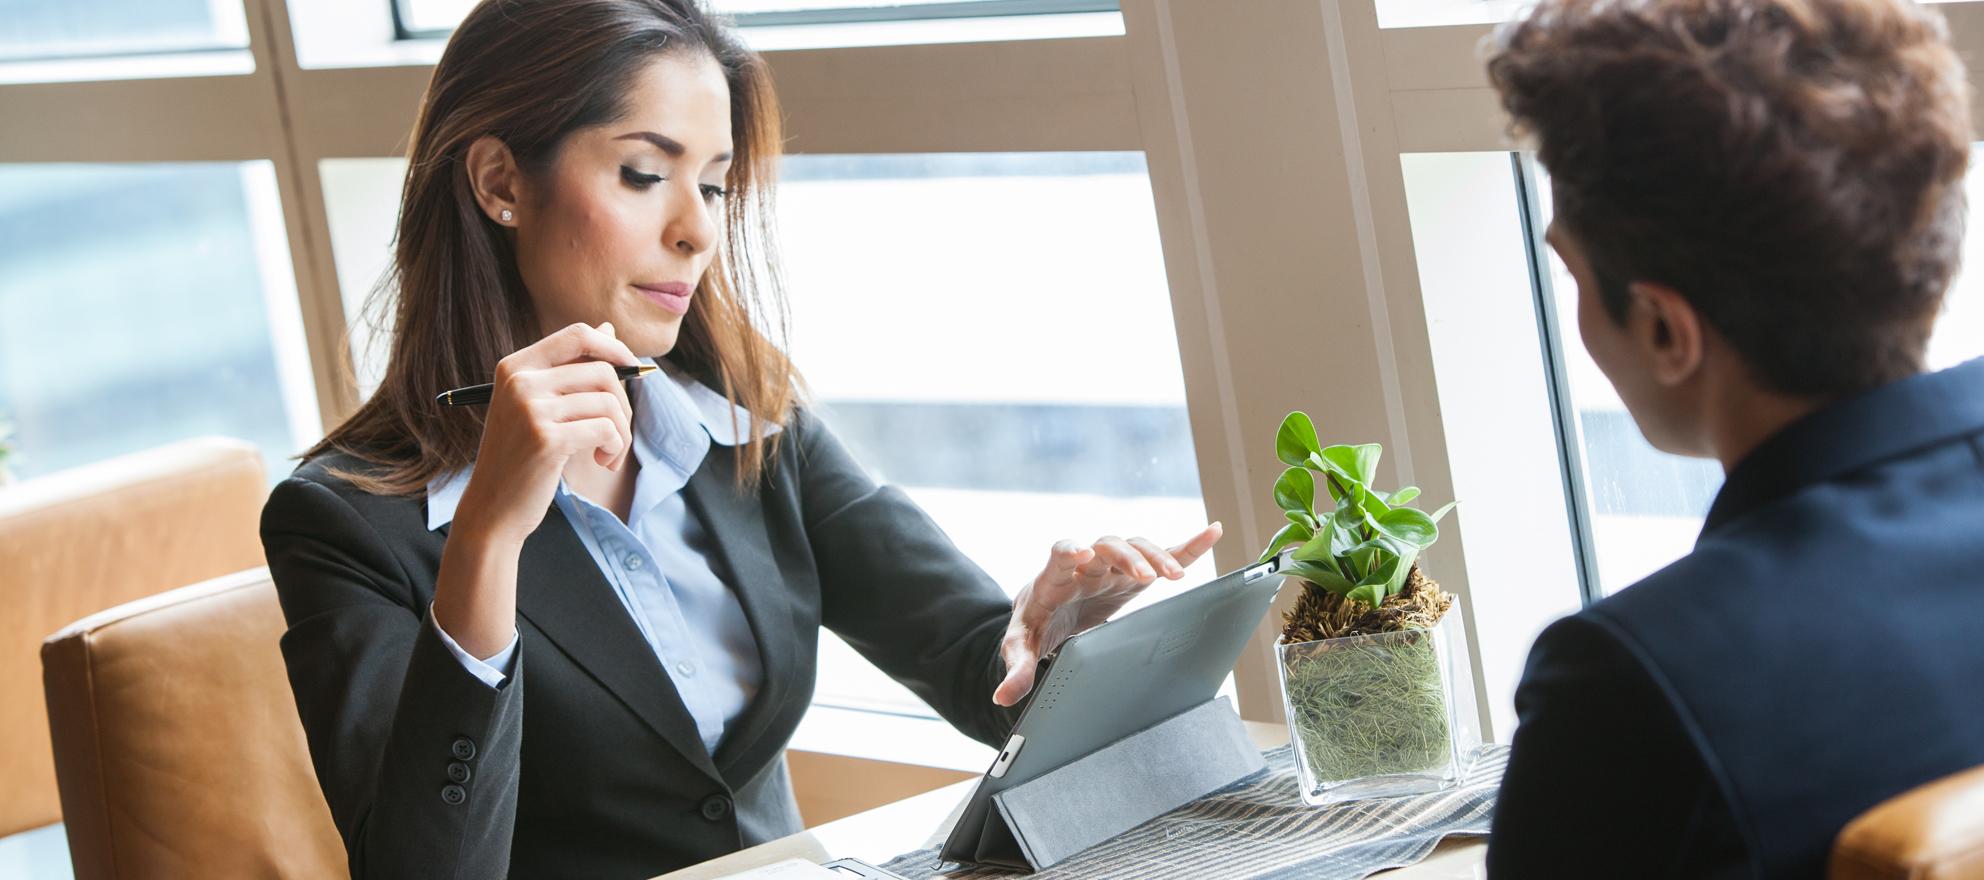 CINC debuts 'Pro Broker' to make life easier for indie brokerages